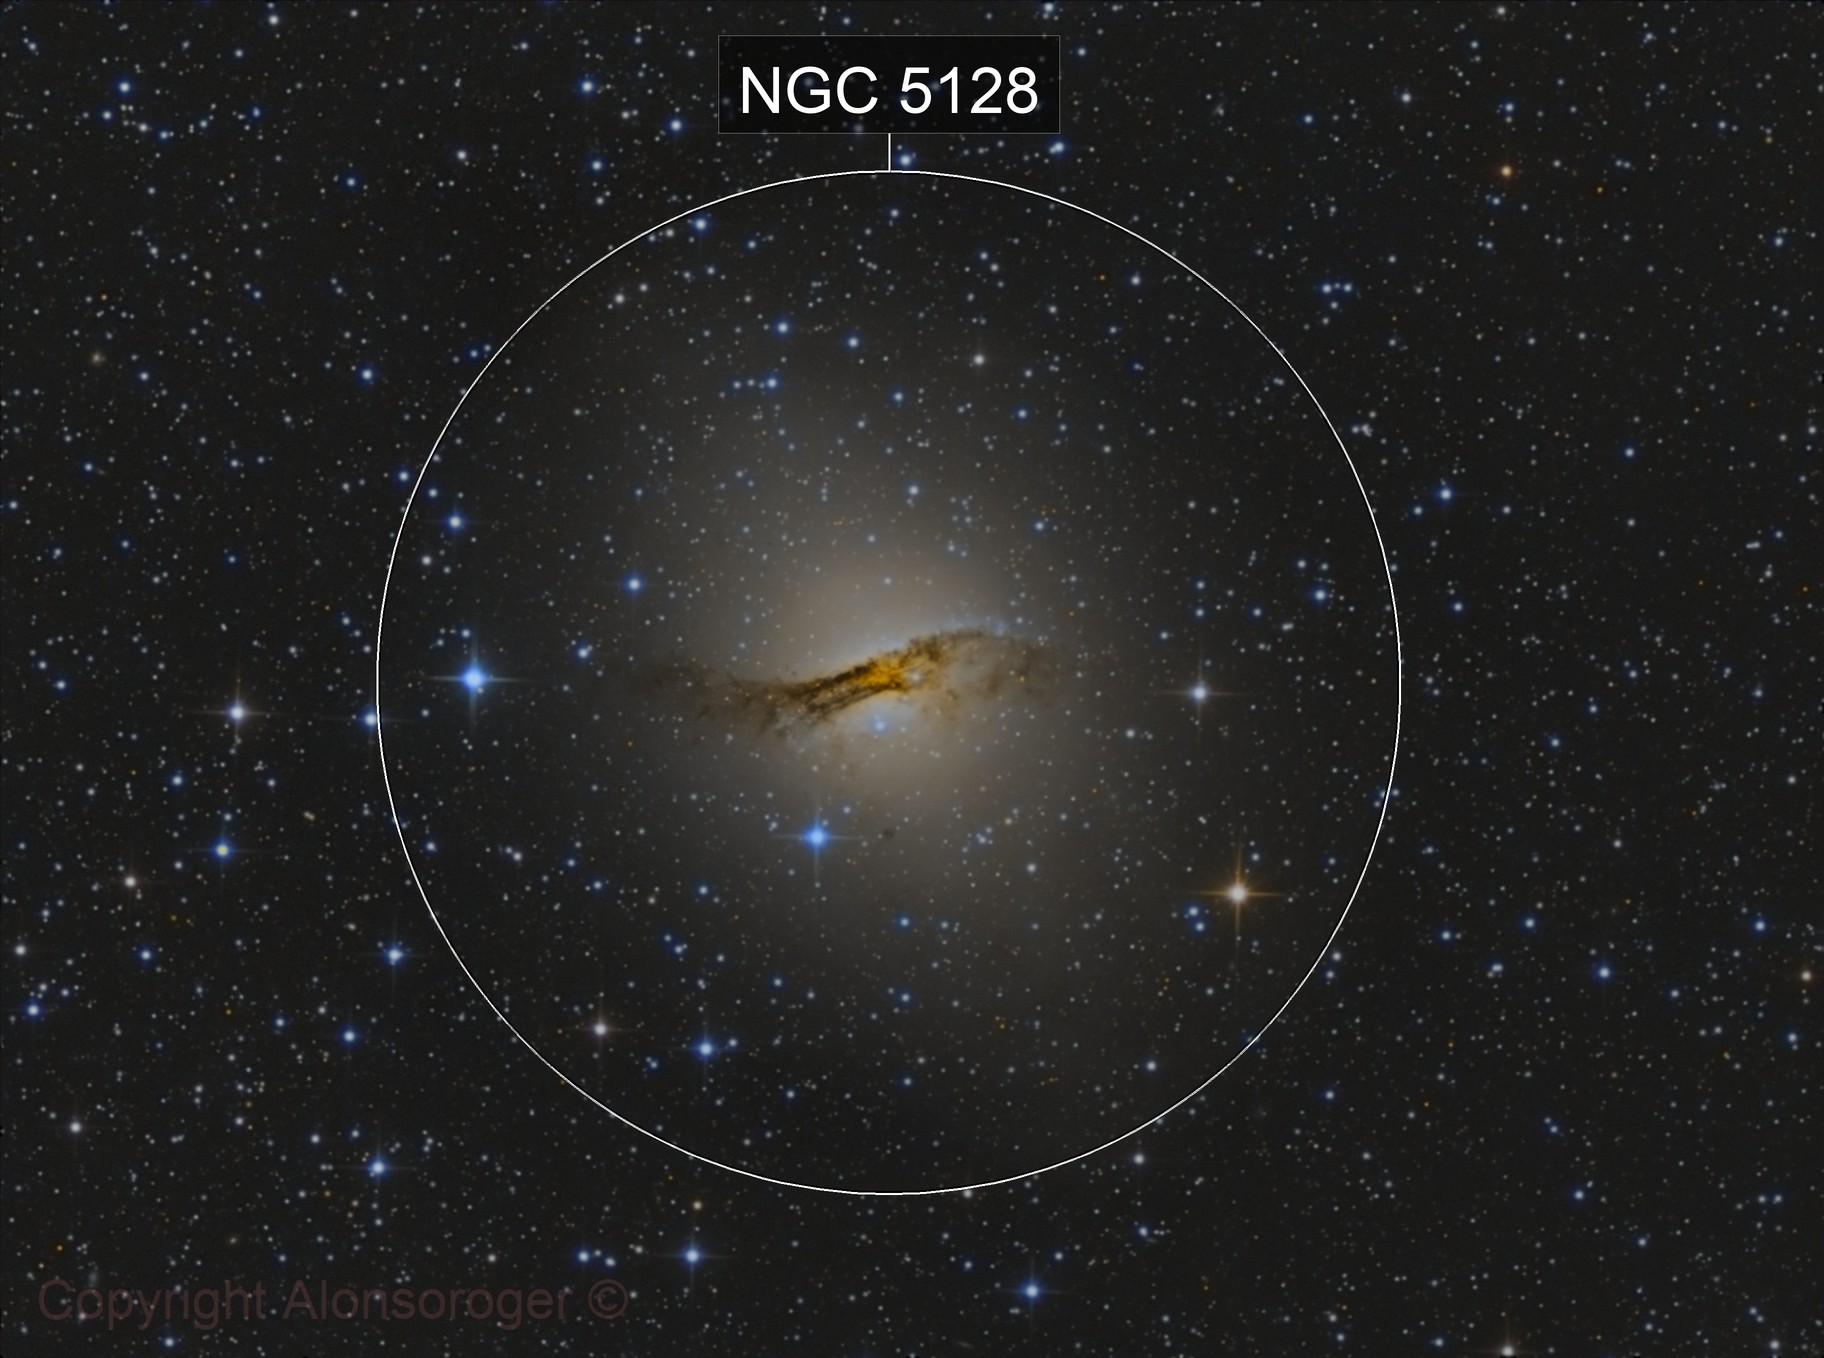 Centaurus A (NGC 5128)